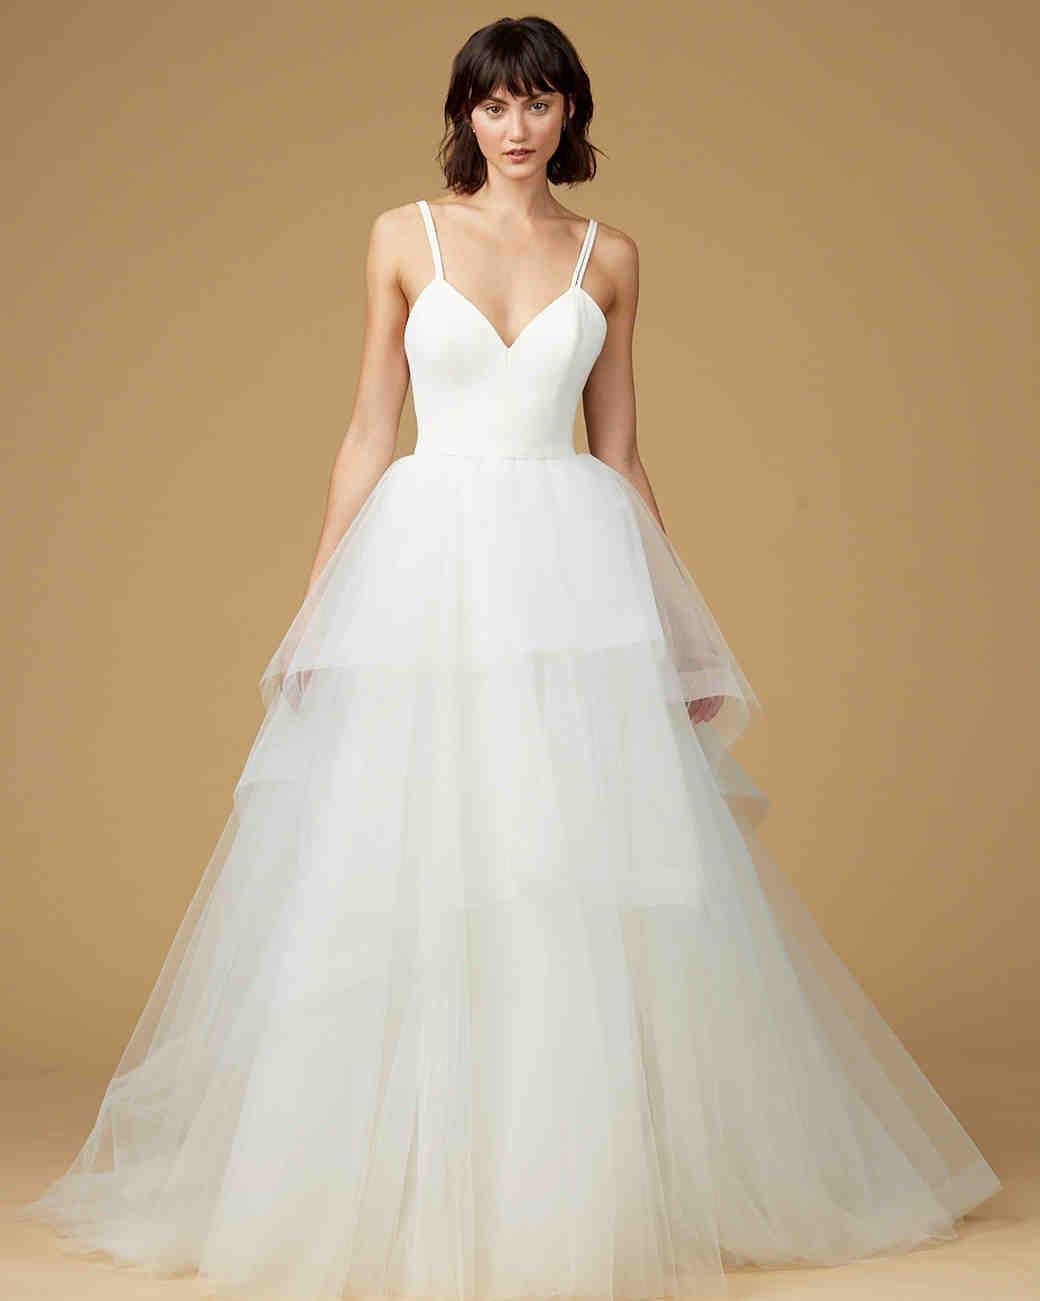 Audrey Hepburn Inspired Wedding Dresses 61 Good Amsale Nouvelle Fall Wedding